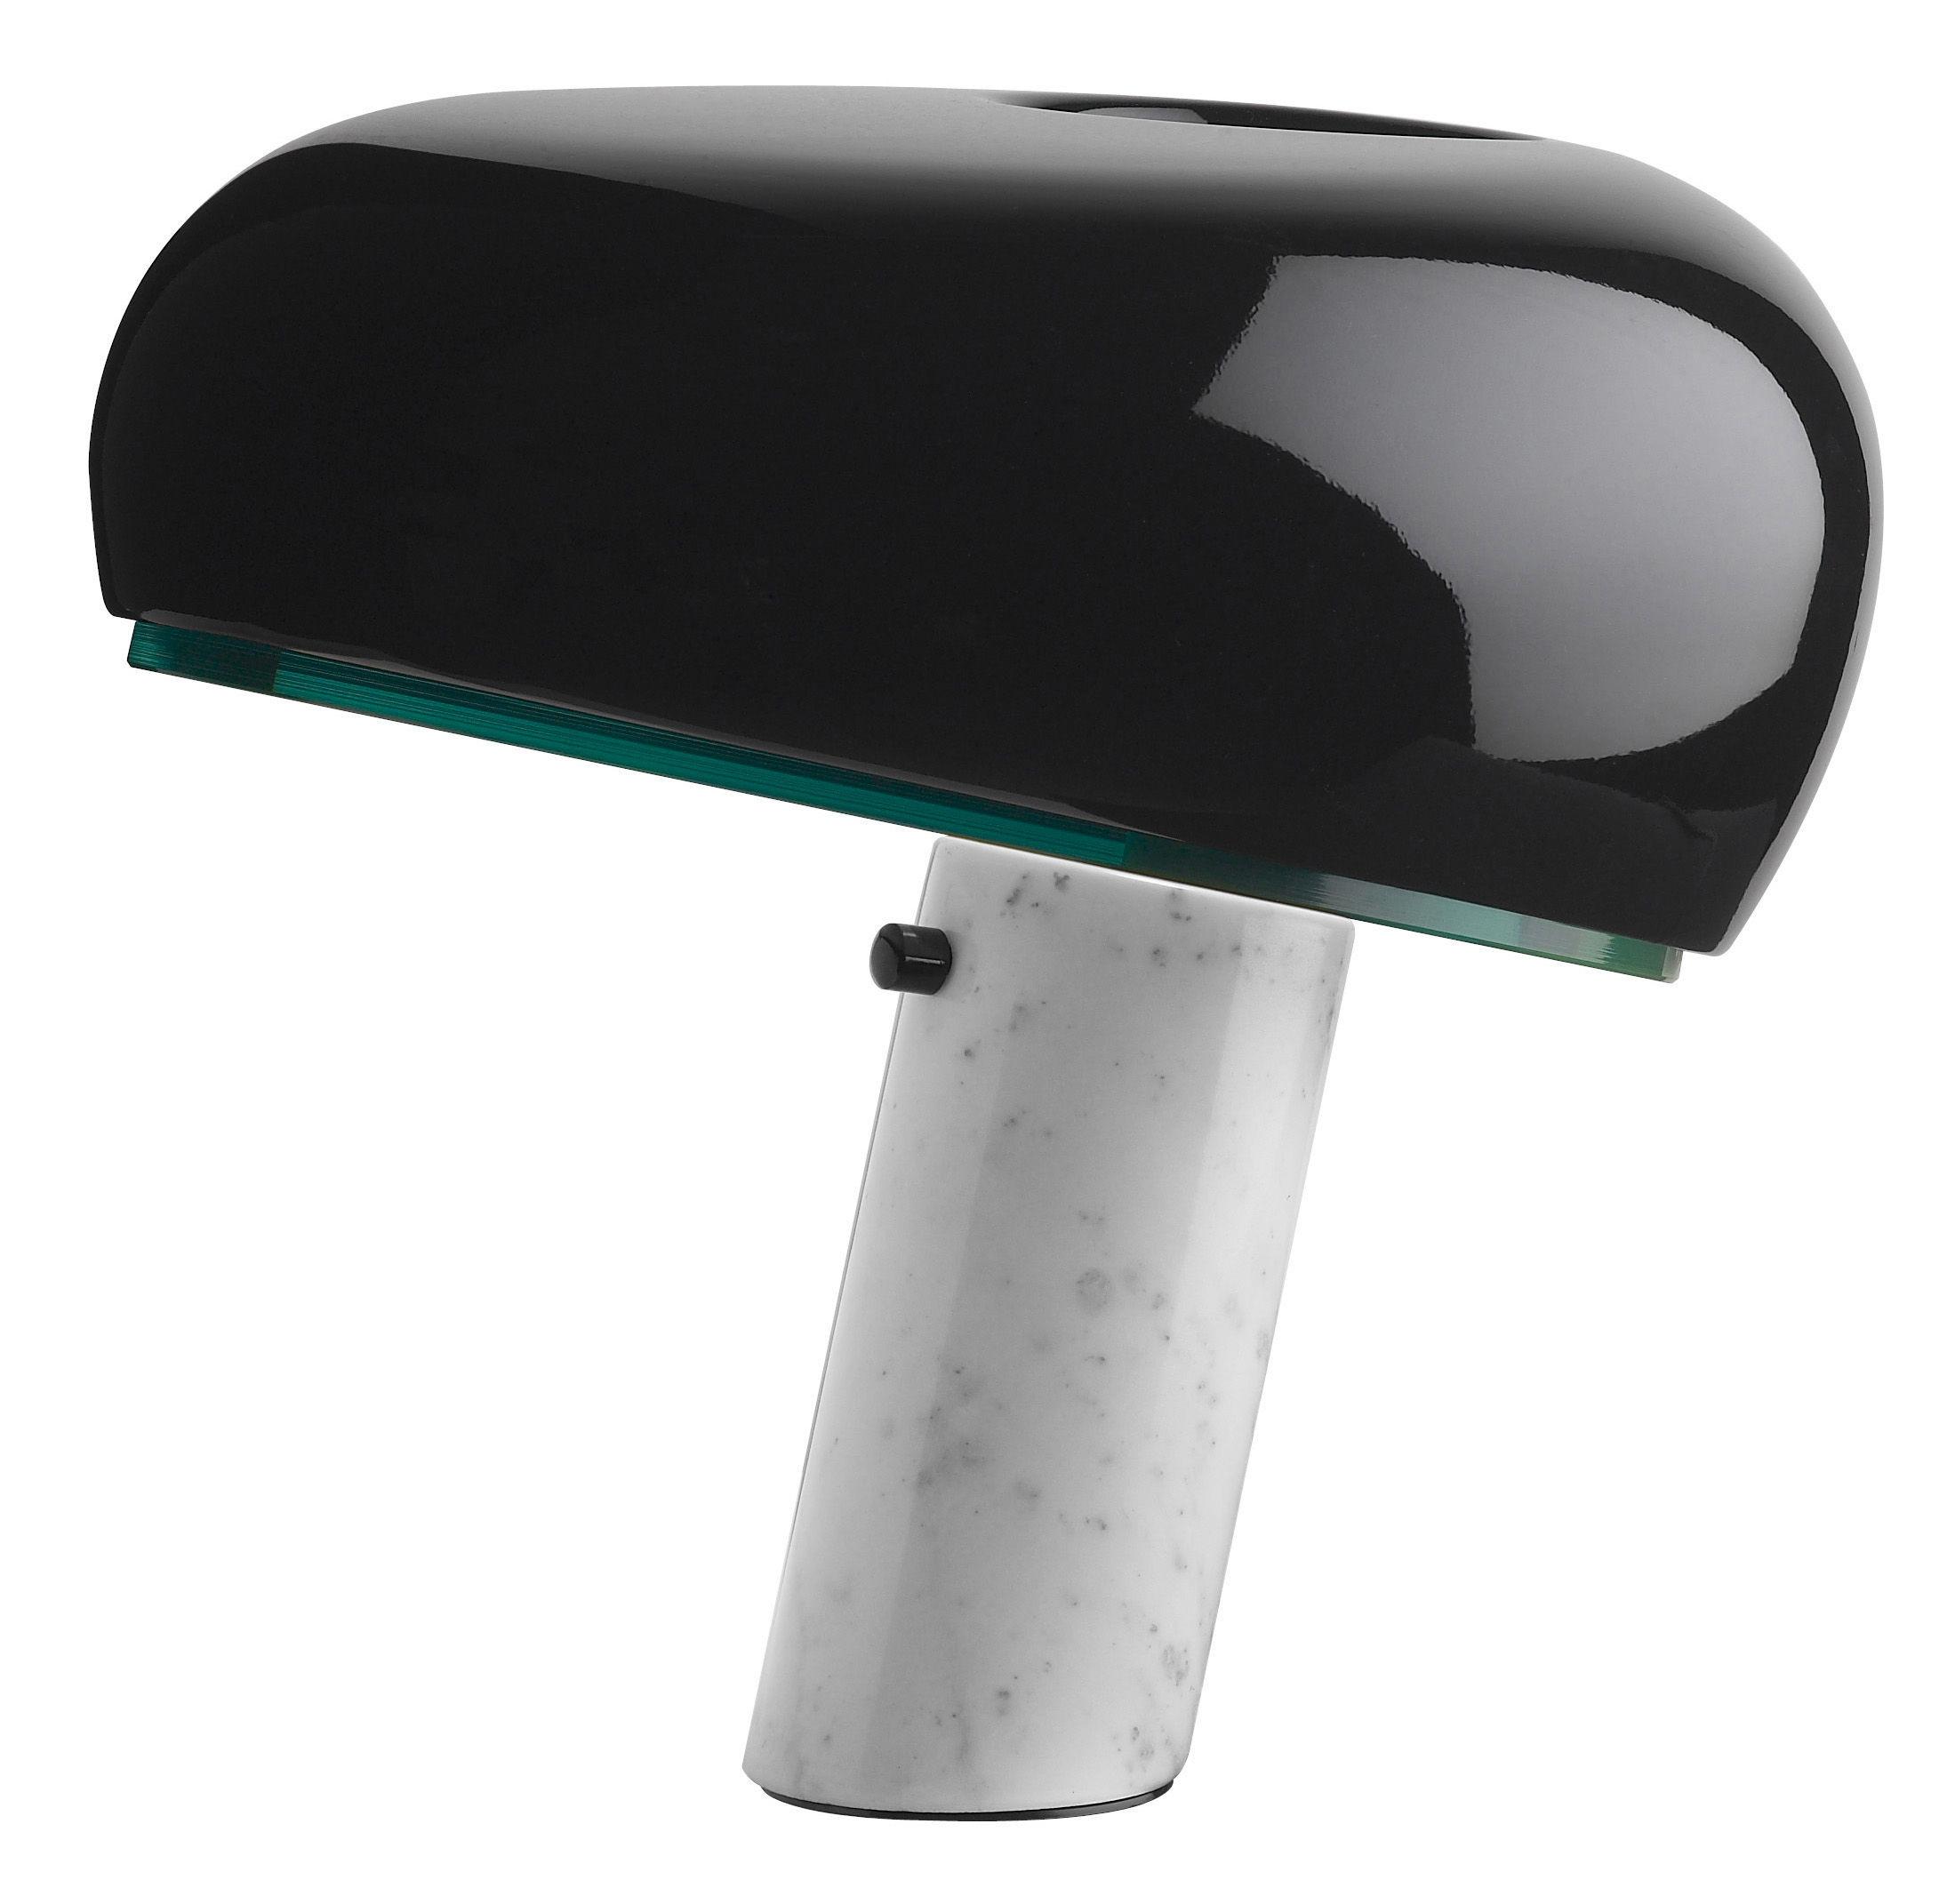 lampe de table snoopy m tal base marbre noir brillant base blanche flos. Black Bedroom Furniture Sets. Home Design Ideas